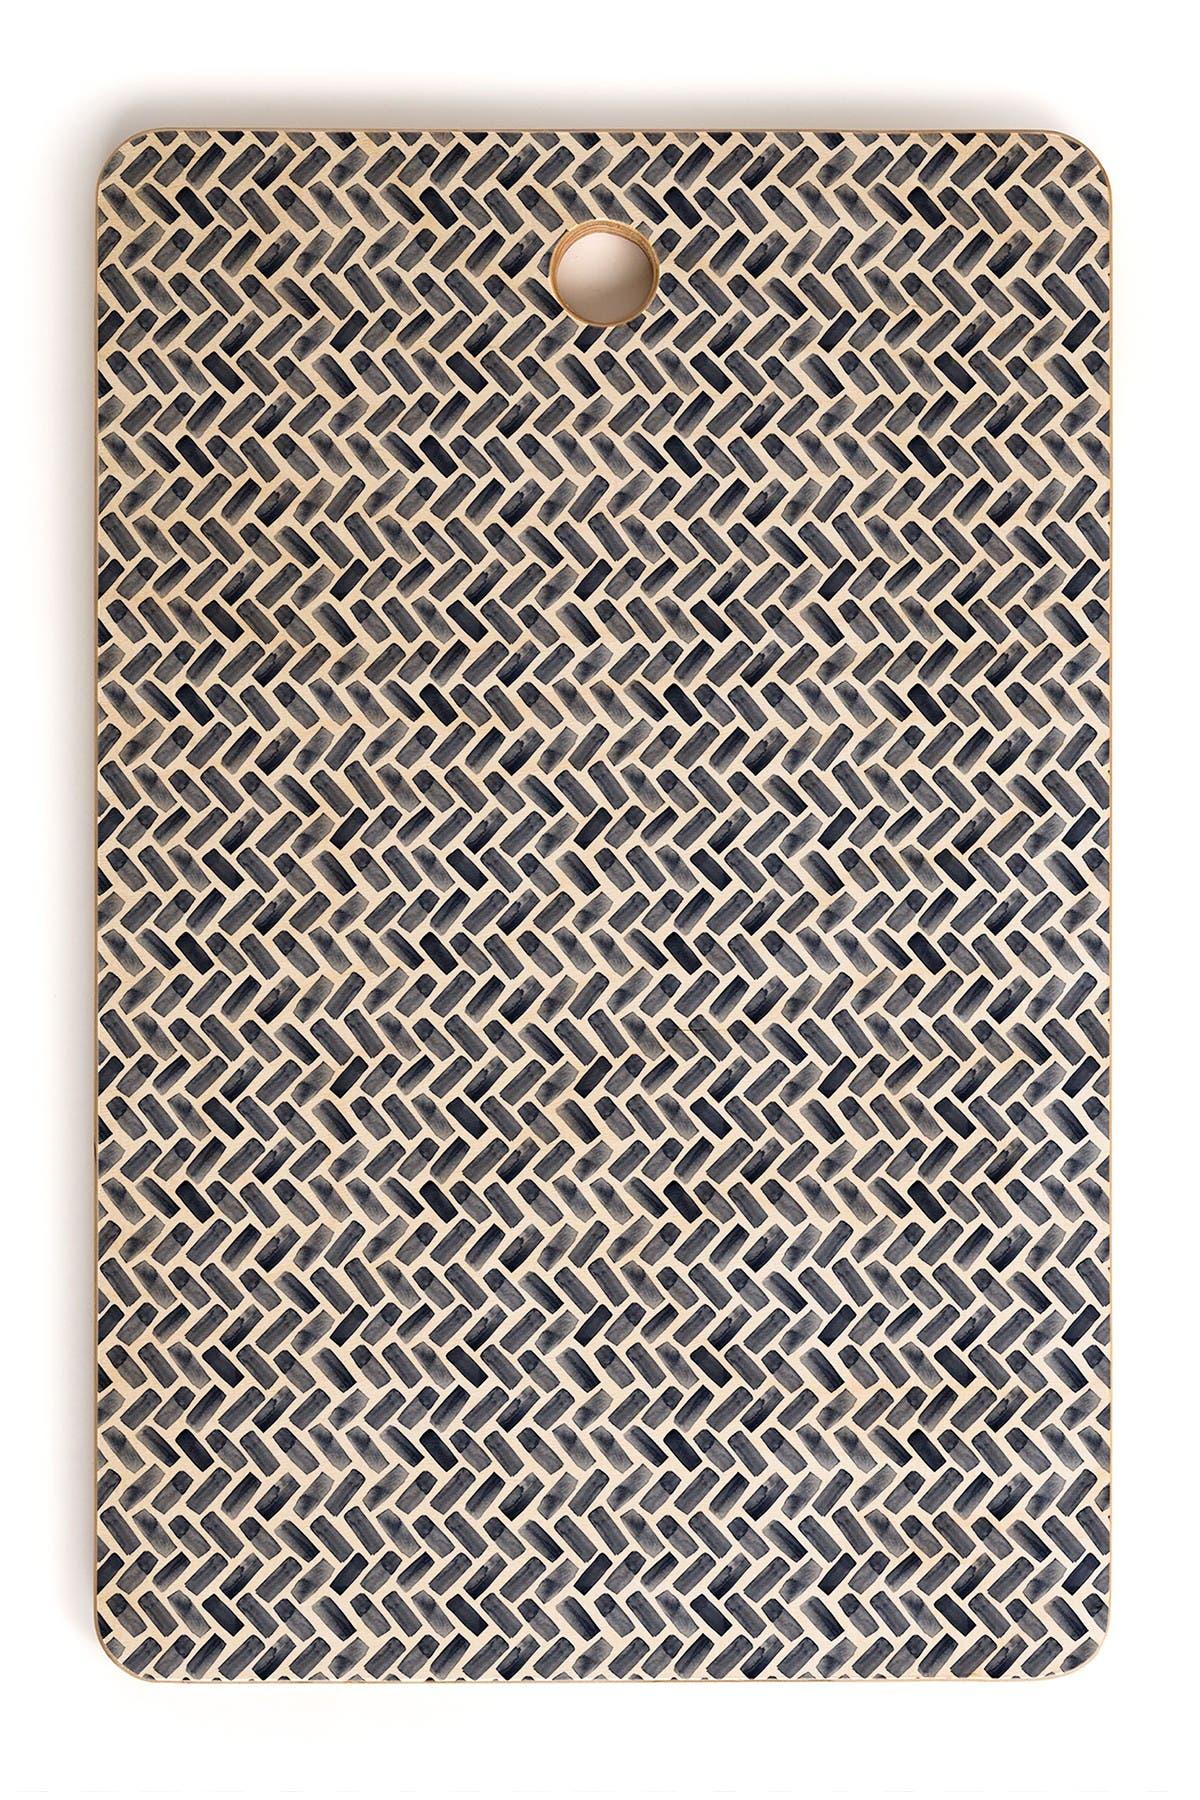 Image of Deny Designs Little Arrow Design Co Arcadia Herringbone In Indigo Rectangle Cutting Board